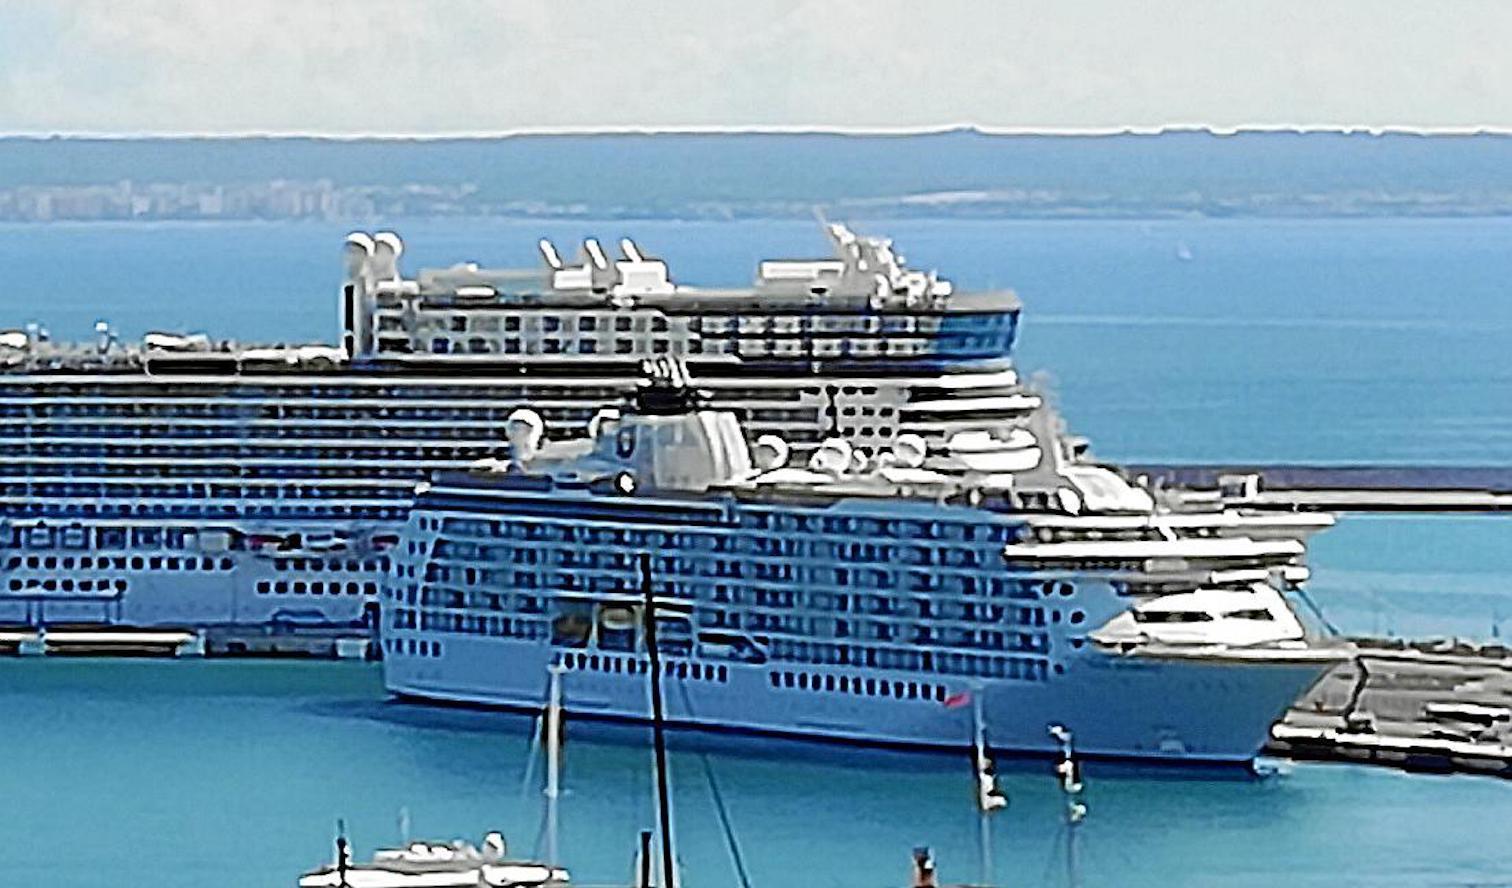 'The World' Cruise Ship docked in Palma.